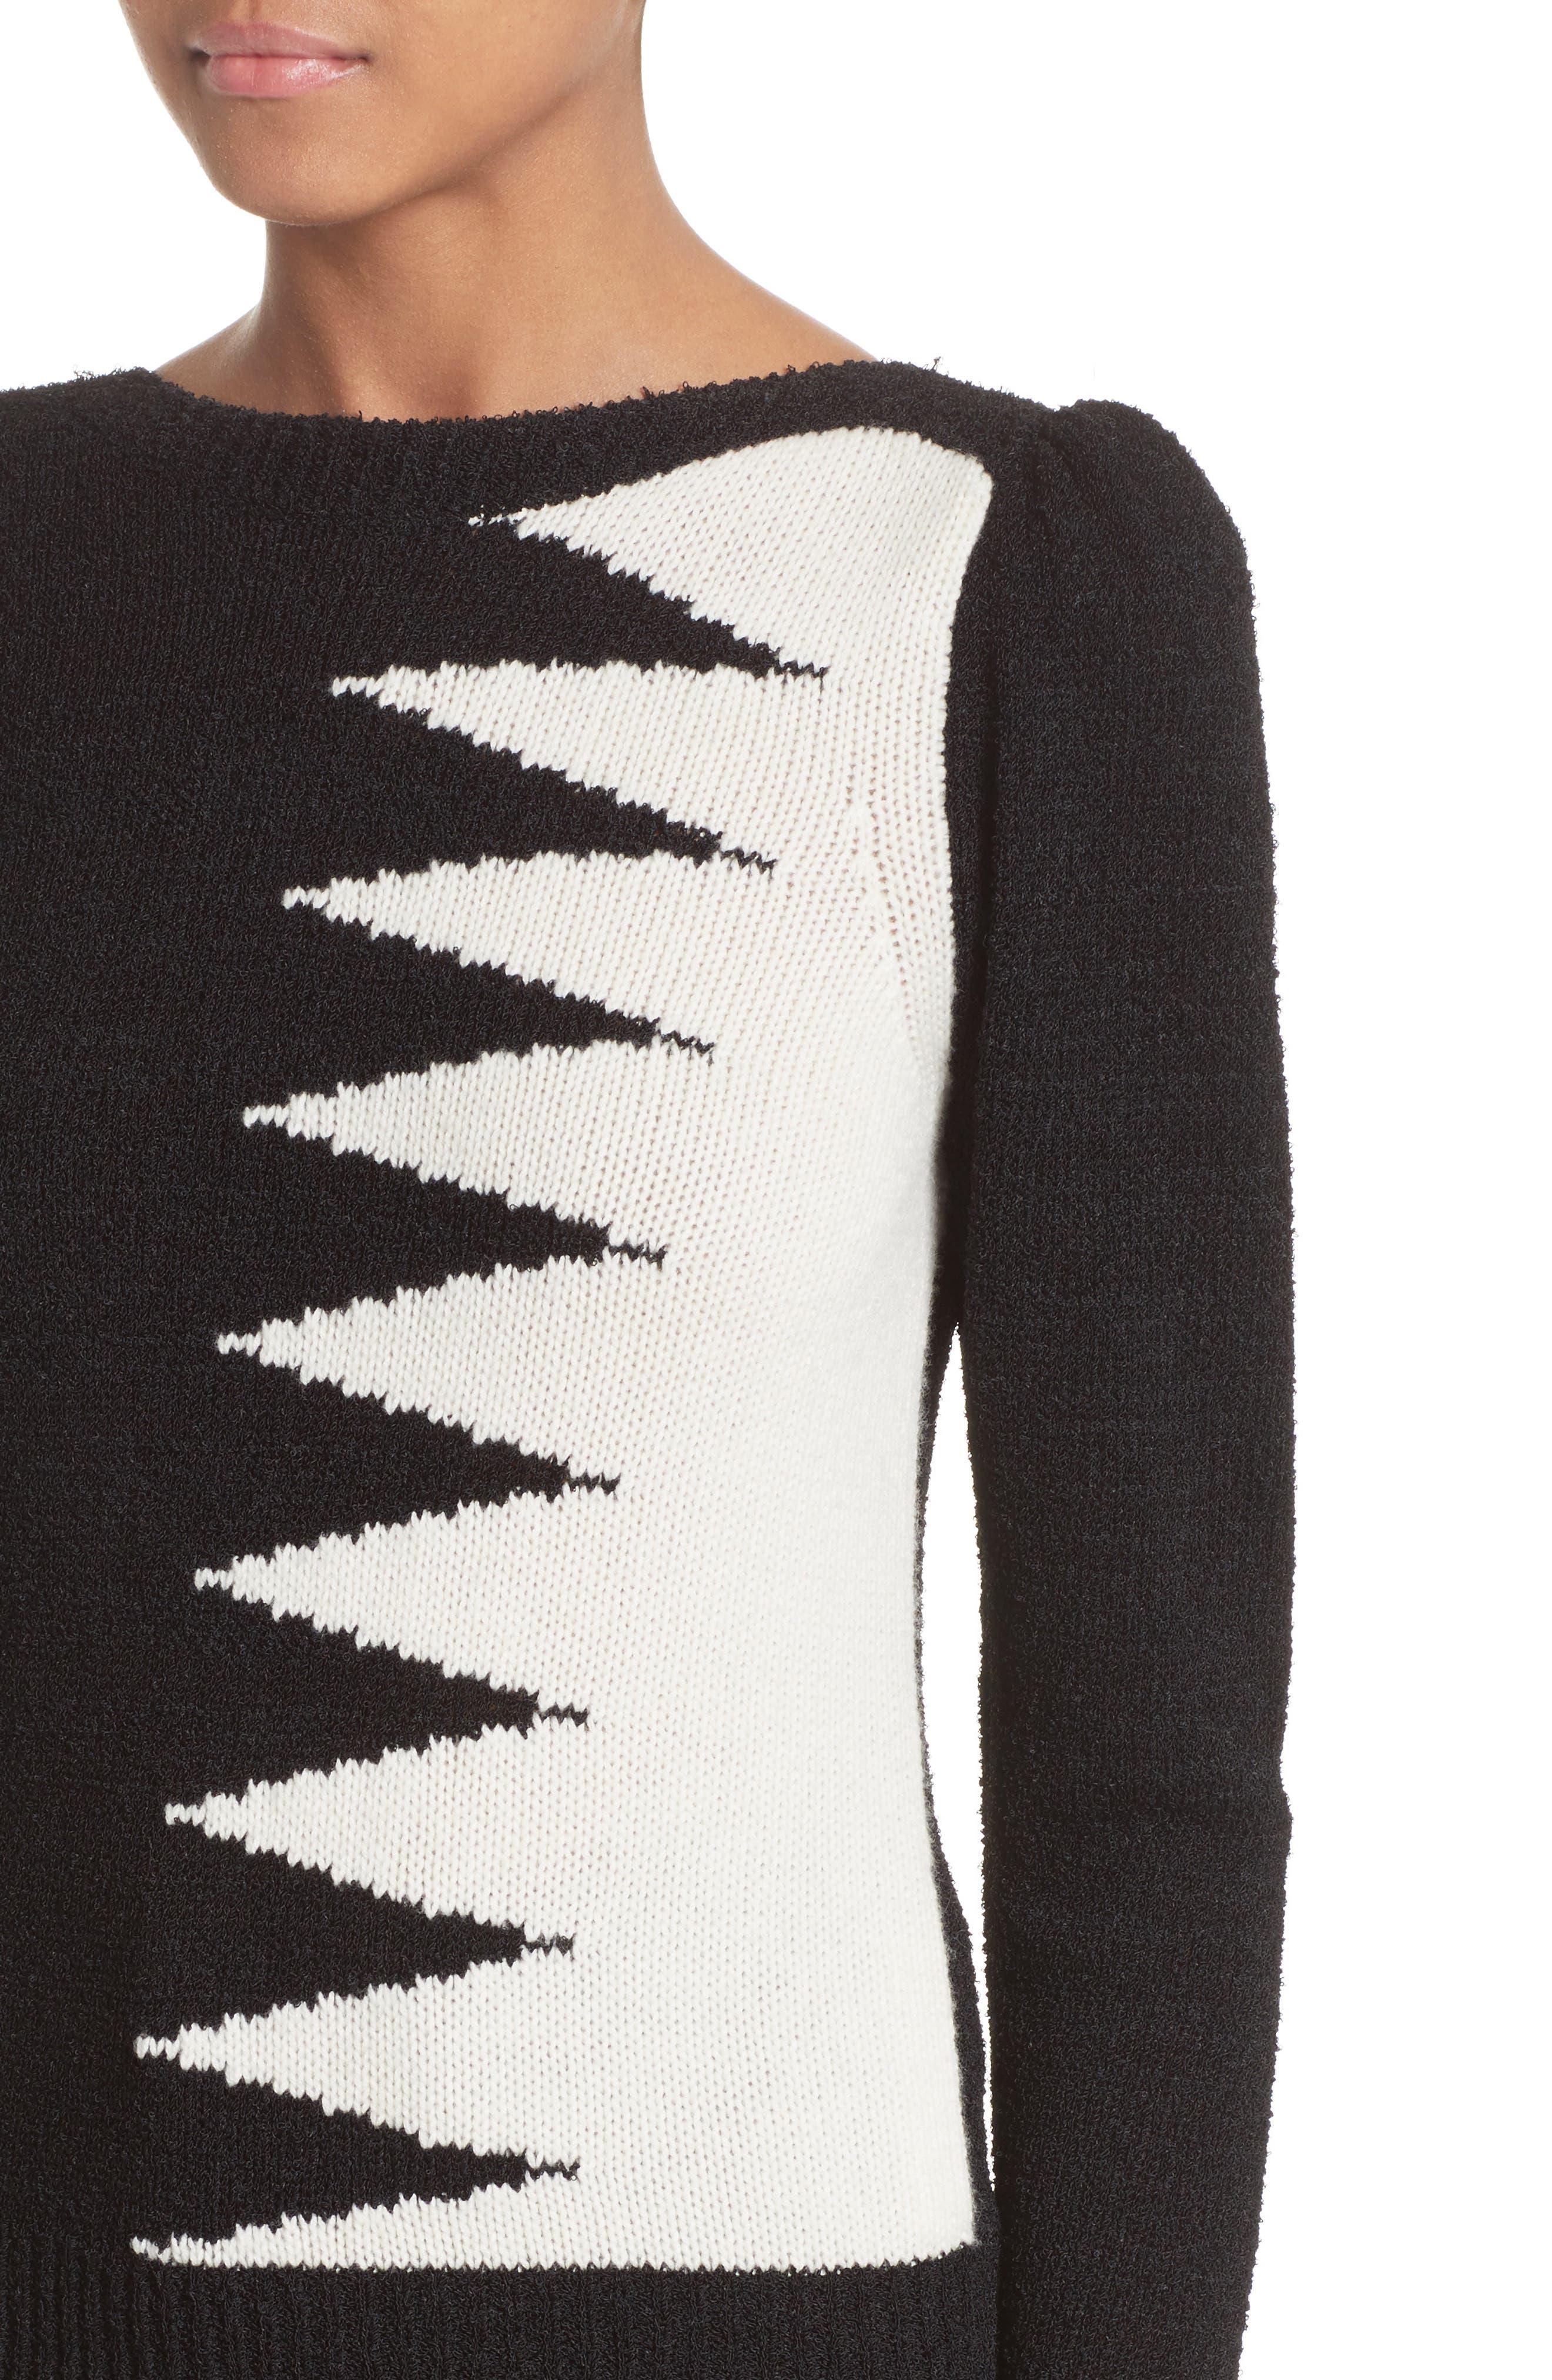 40s Intarsia Sweater,                             Alternate thumbnail 7, color,                             Black Multi